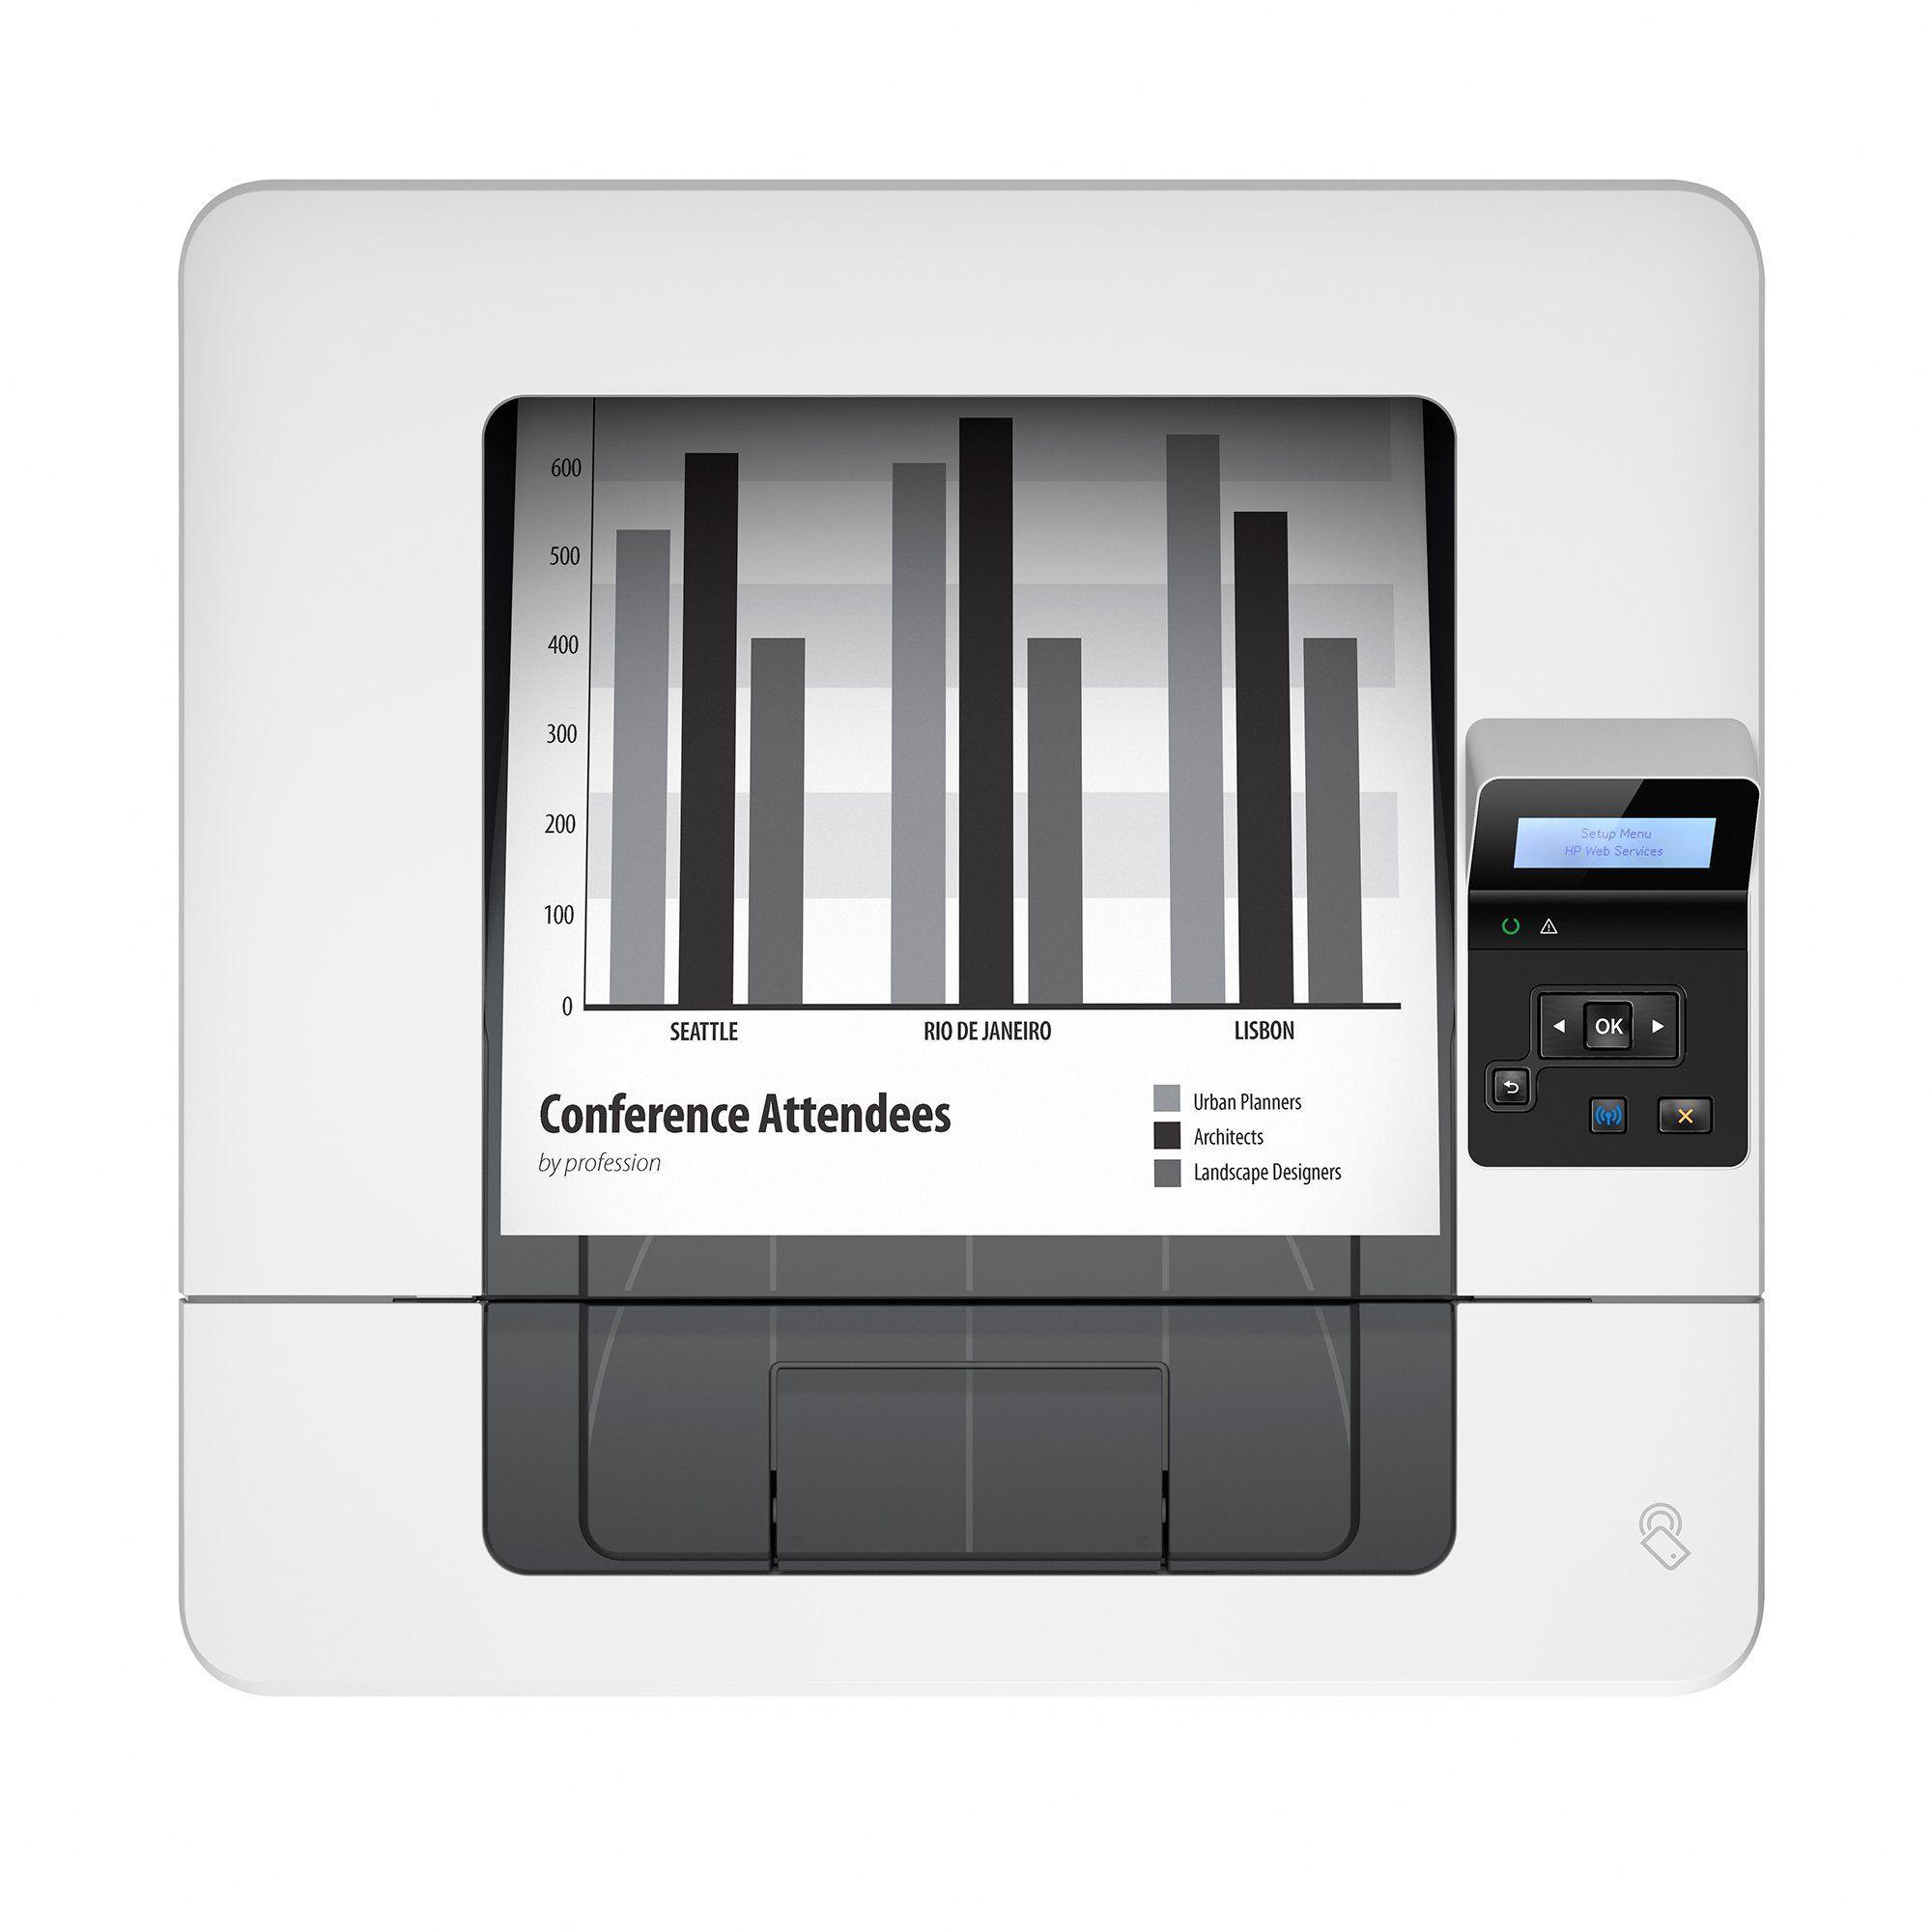 HP LaserJet Pro M402dw Wireless Monochrome Printer Amazon Dash Replenishment Ready C5F95ABGJ